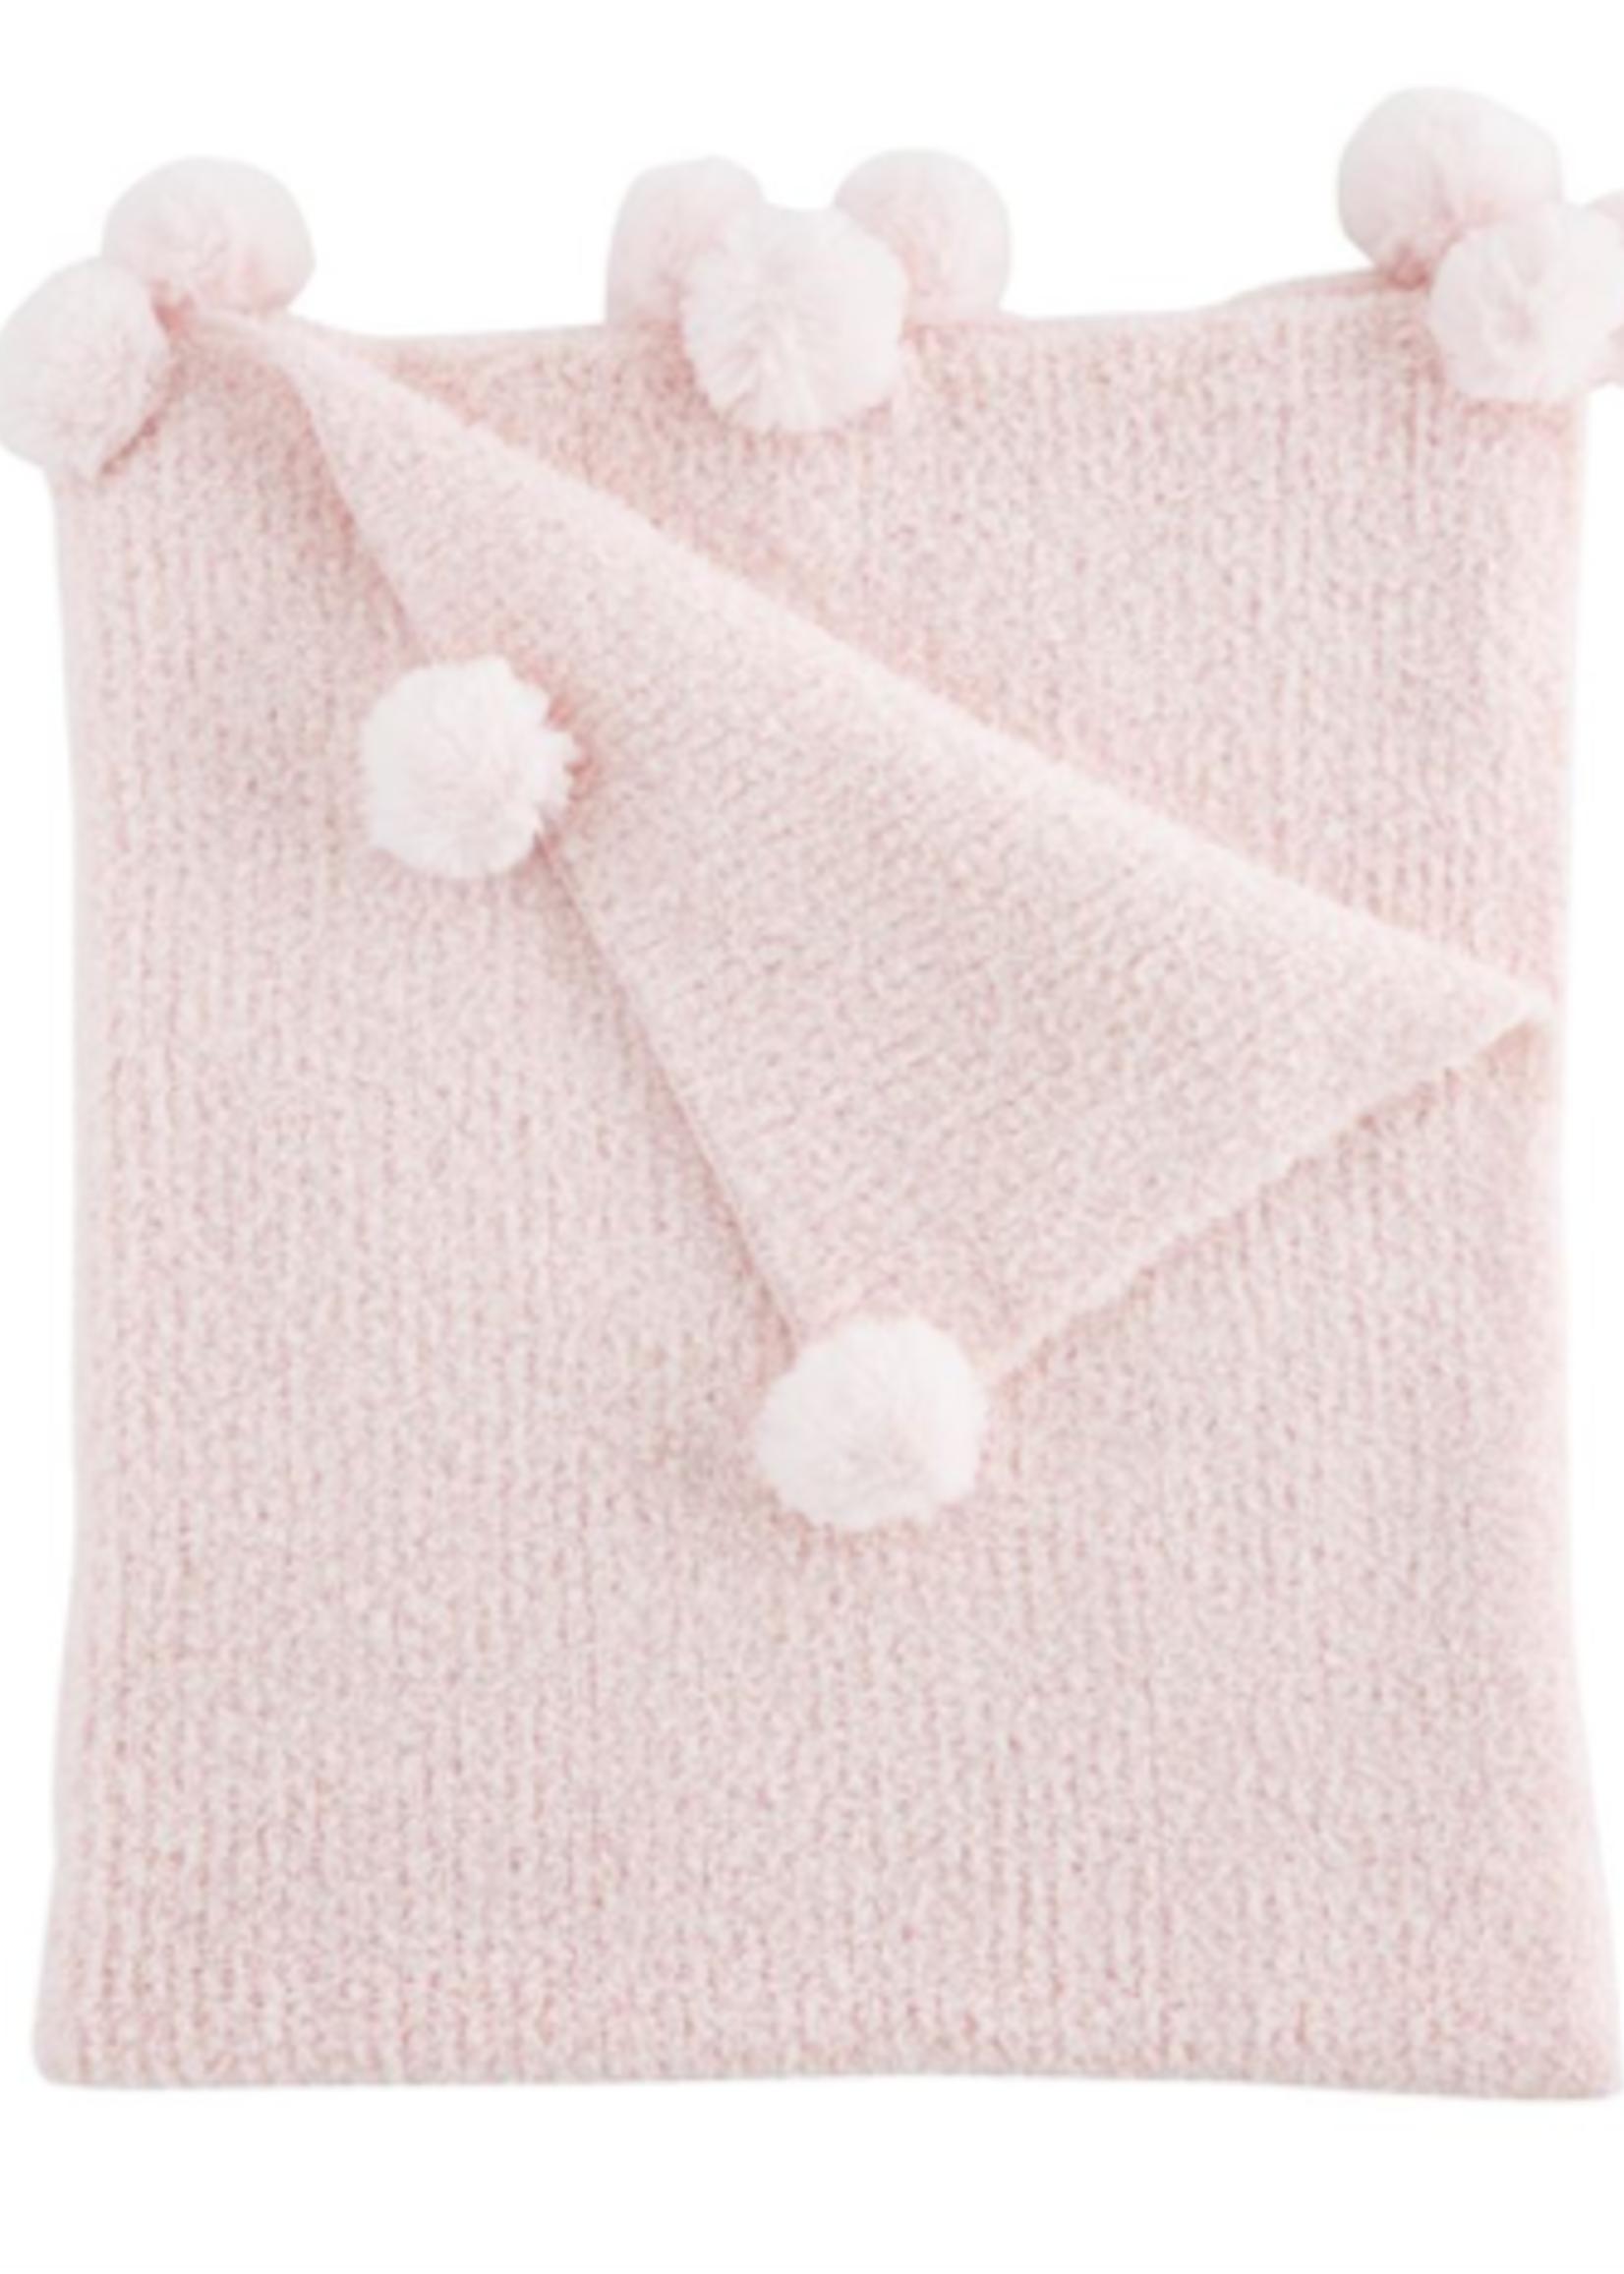 Elitaire Petite Chenille Blankets